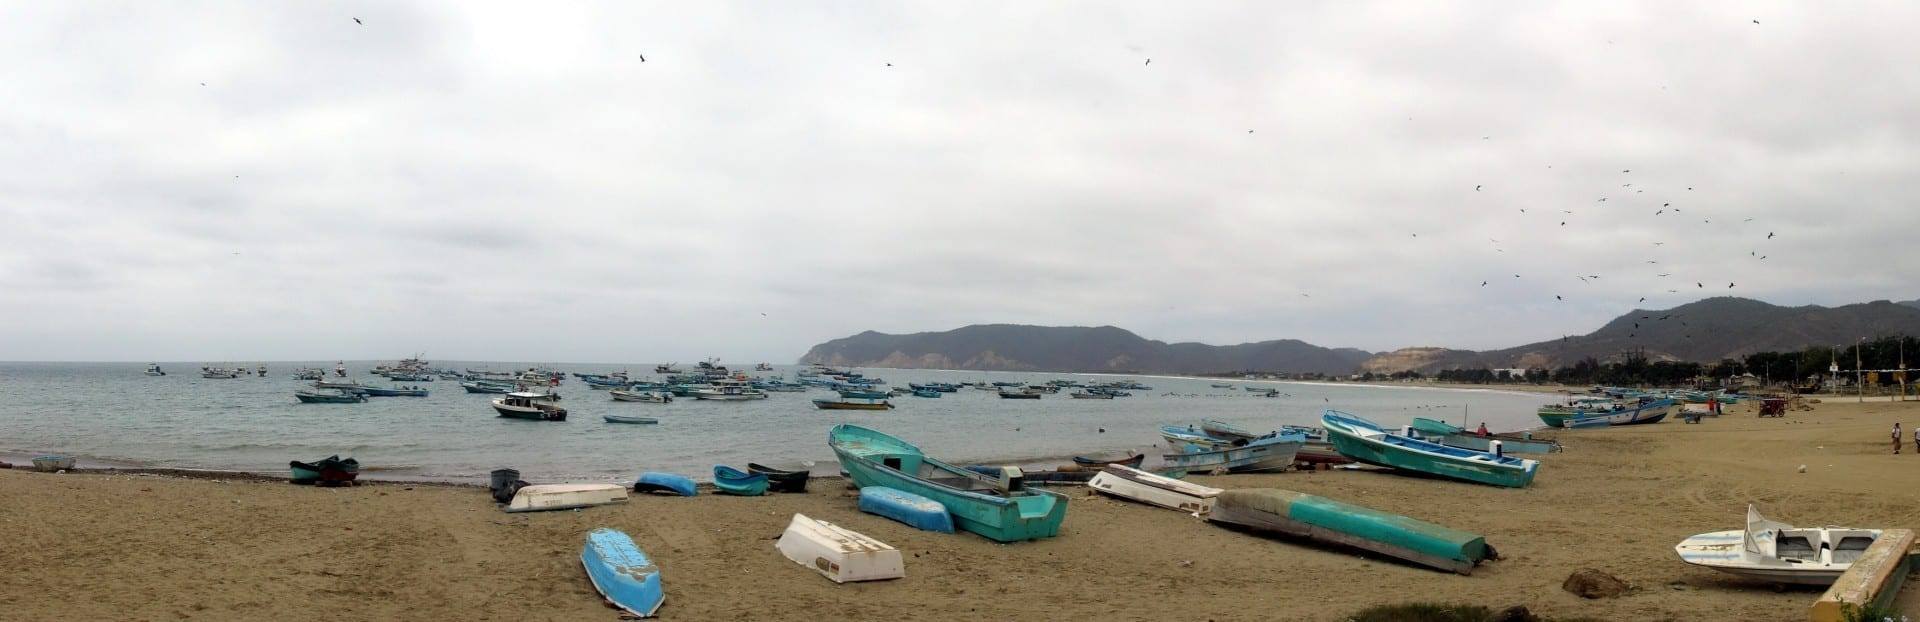 Puerto Lopez beach Puerto López Ecuador